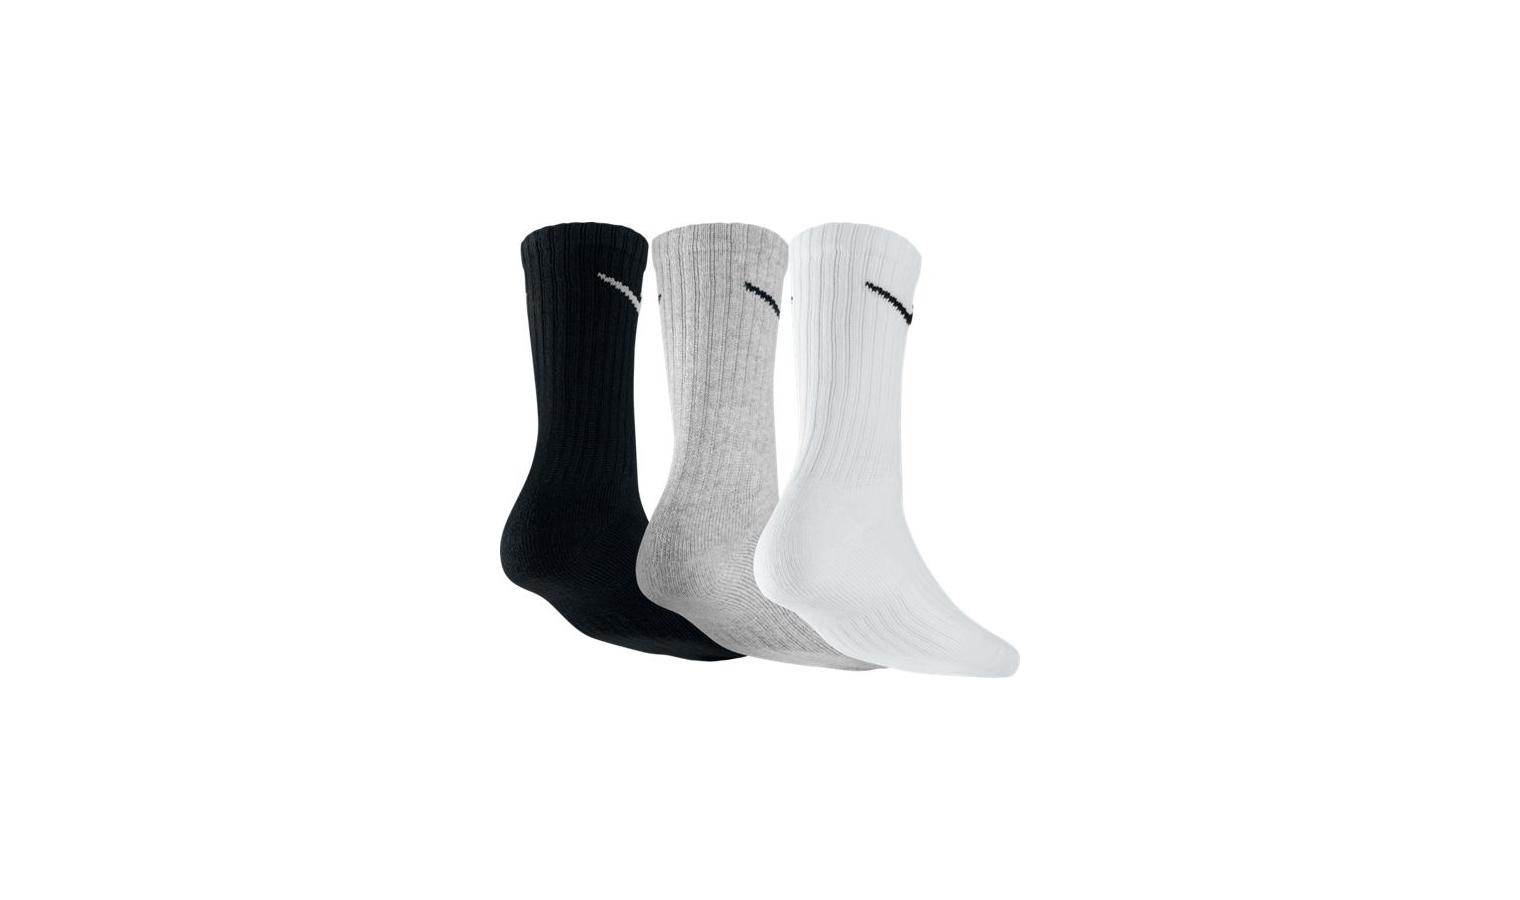 87c2968e397 Ponožky Nike 3PPK VALUE COTTON CREW trikolóra